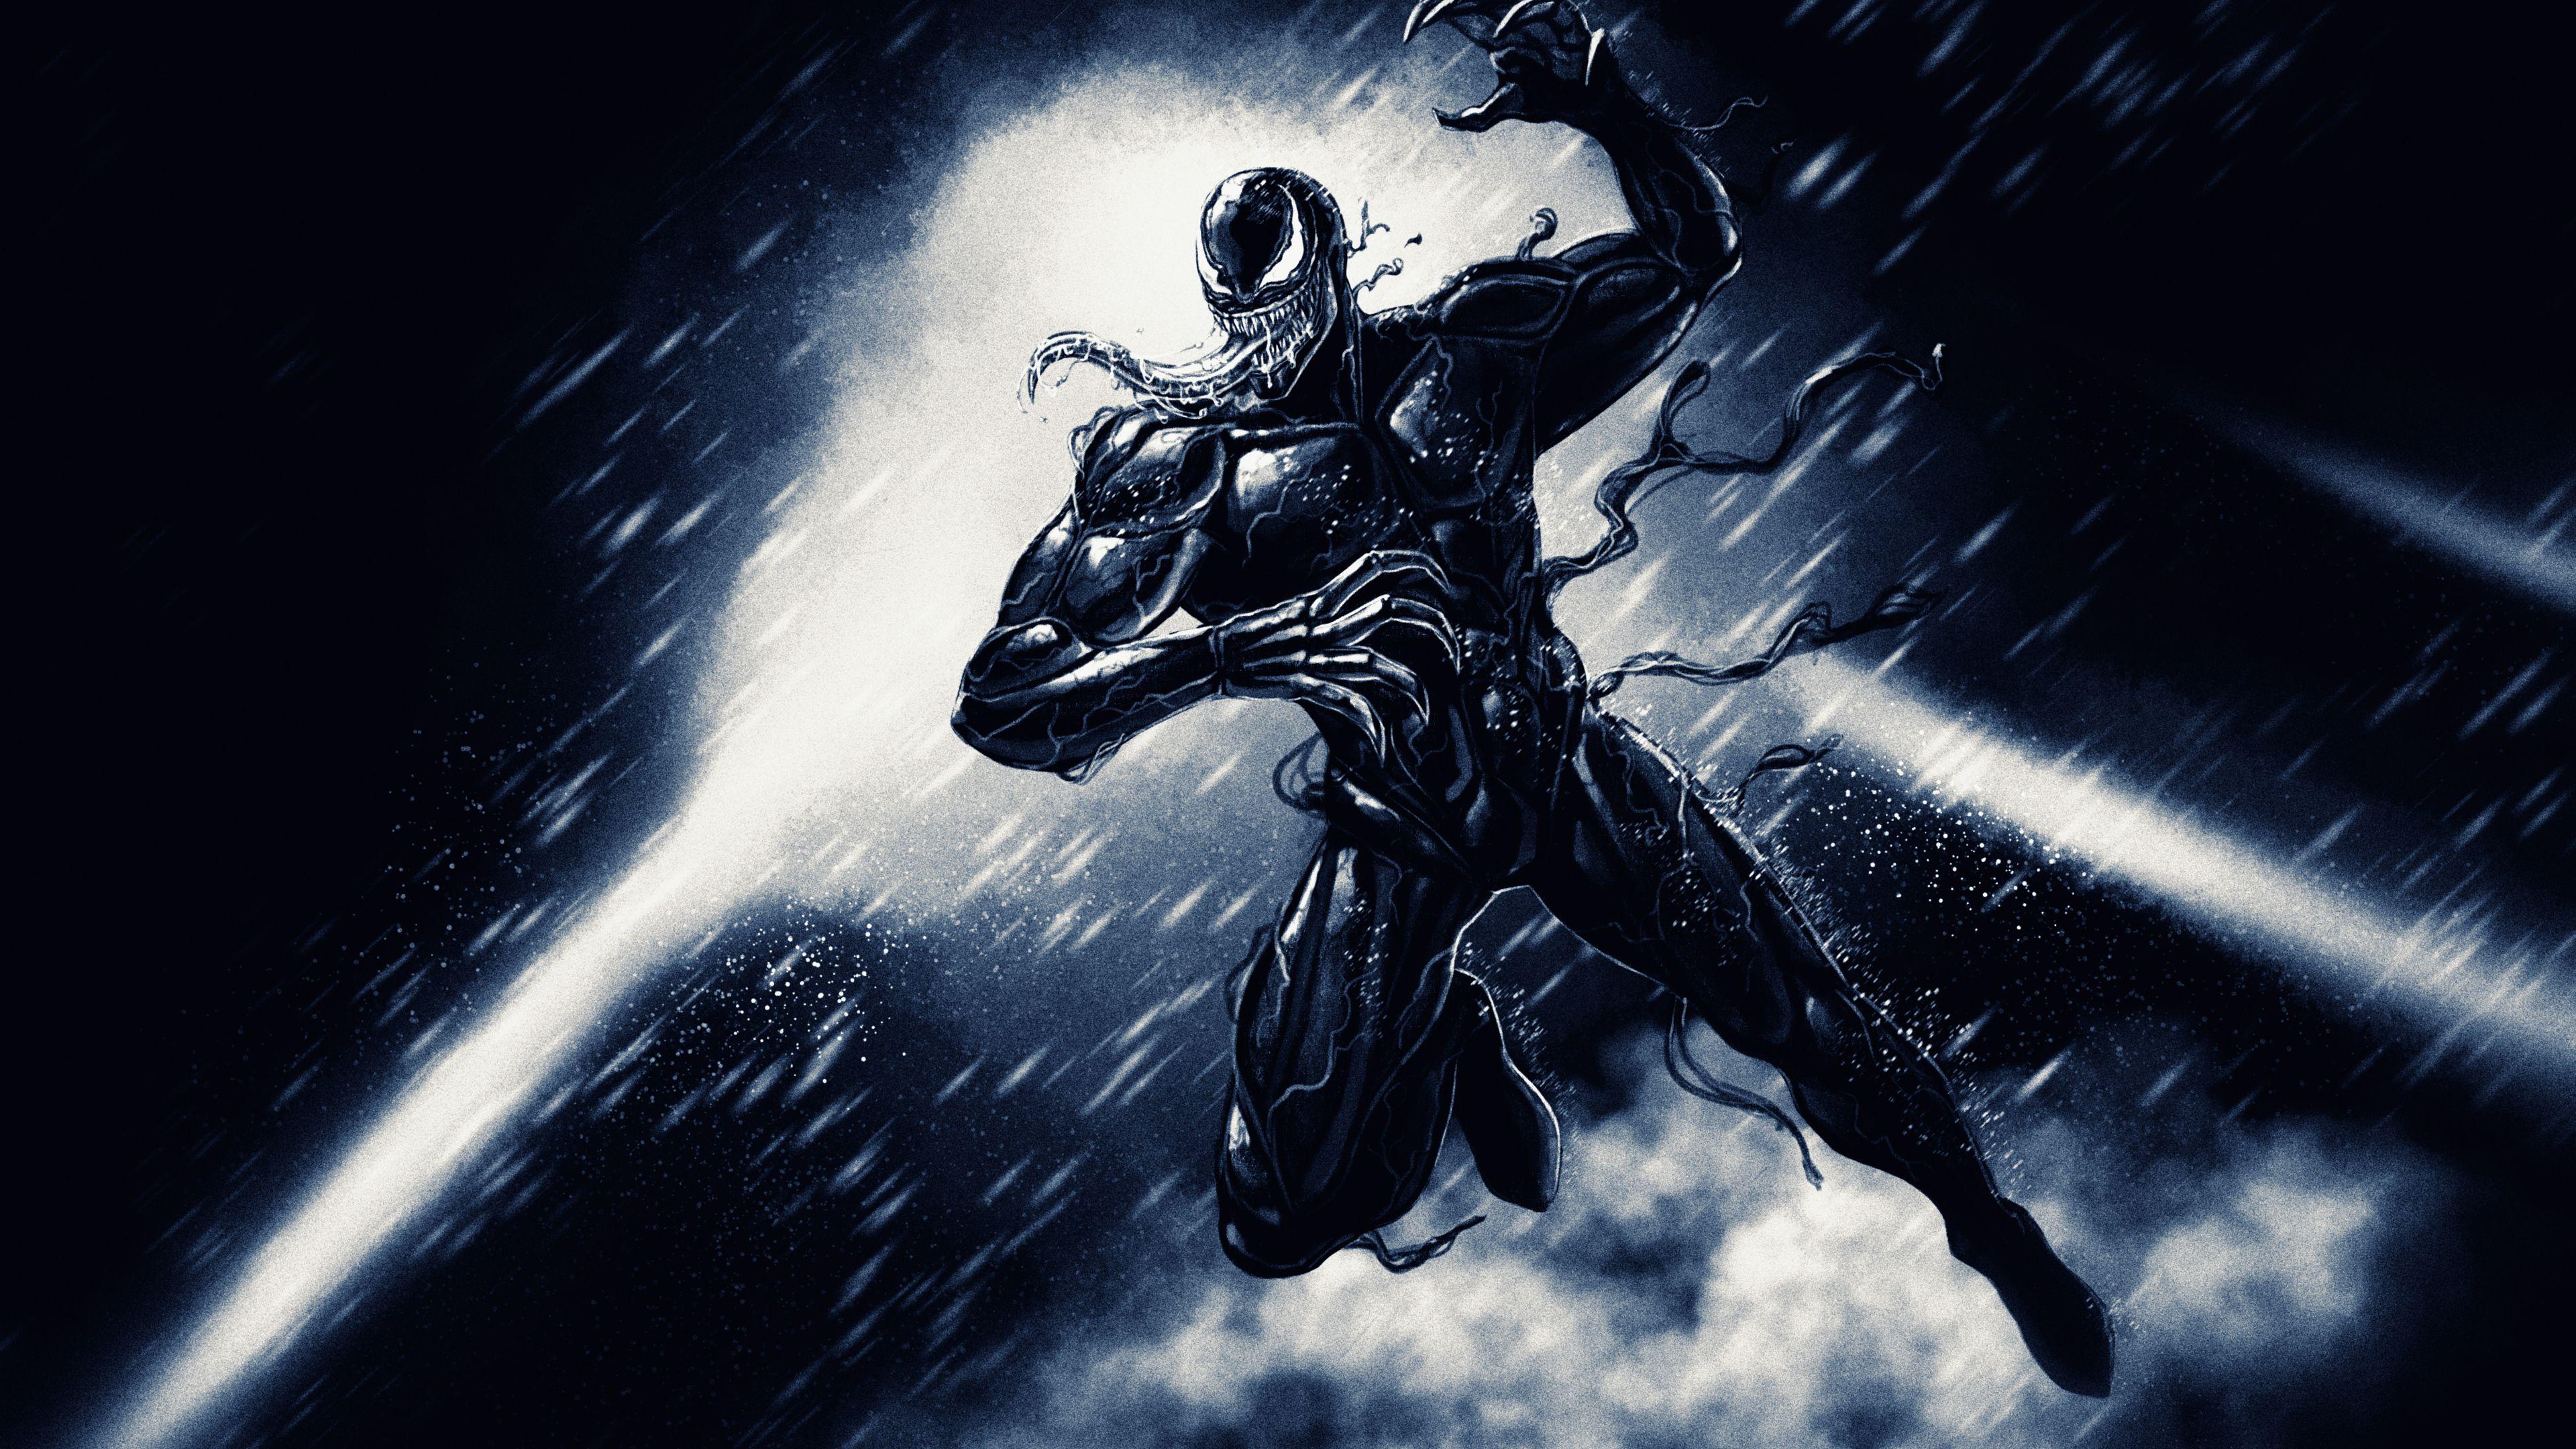 4k Venom Wallpaper Posted By Samantha Johnson